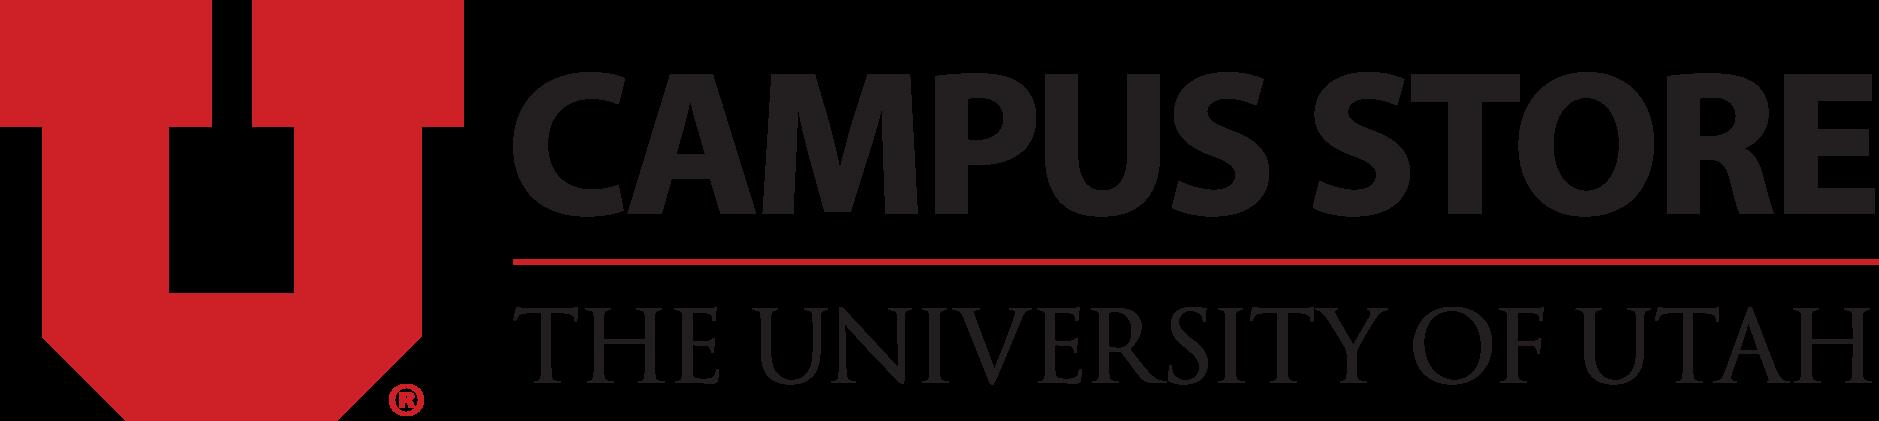 Home university of utah campus store logo for the university campus store fandeluxe Gallery